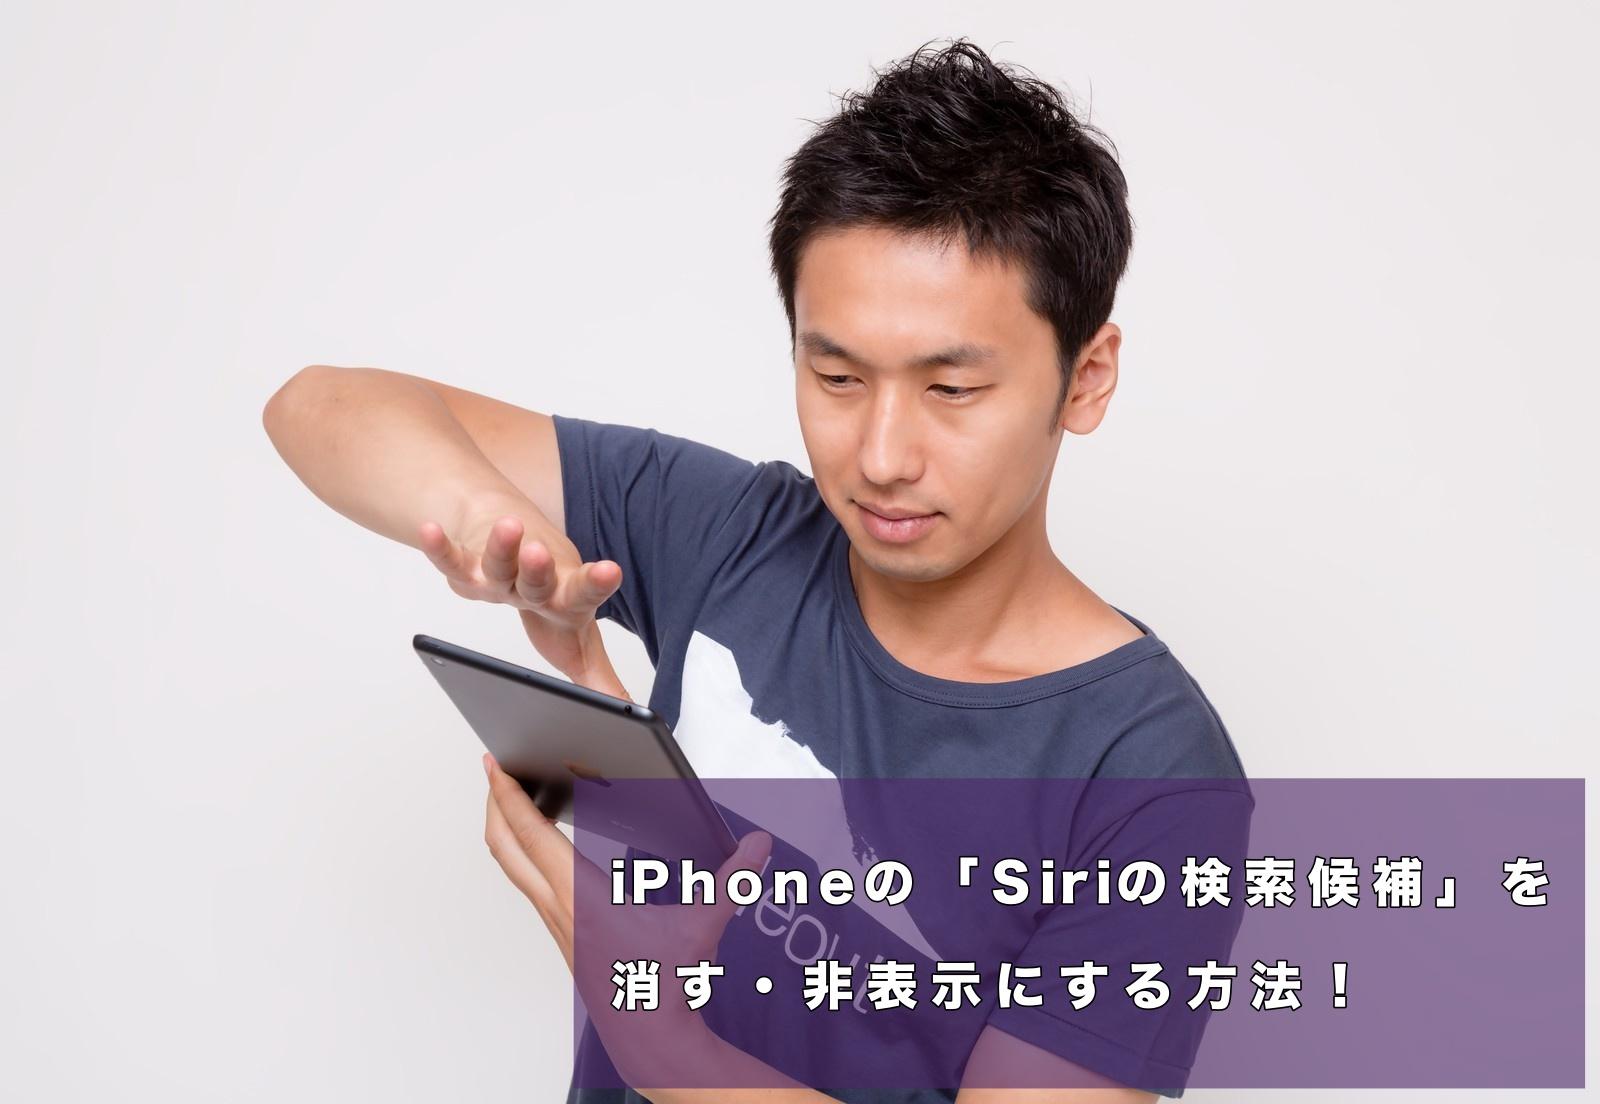 iPhoneの「Siriの検索候補」を消す・非表示にする方法!